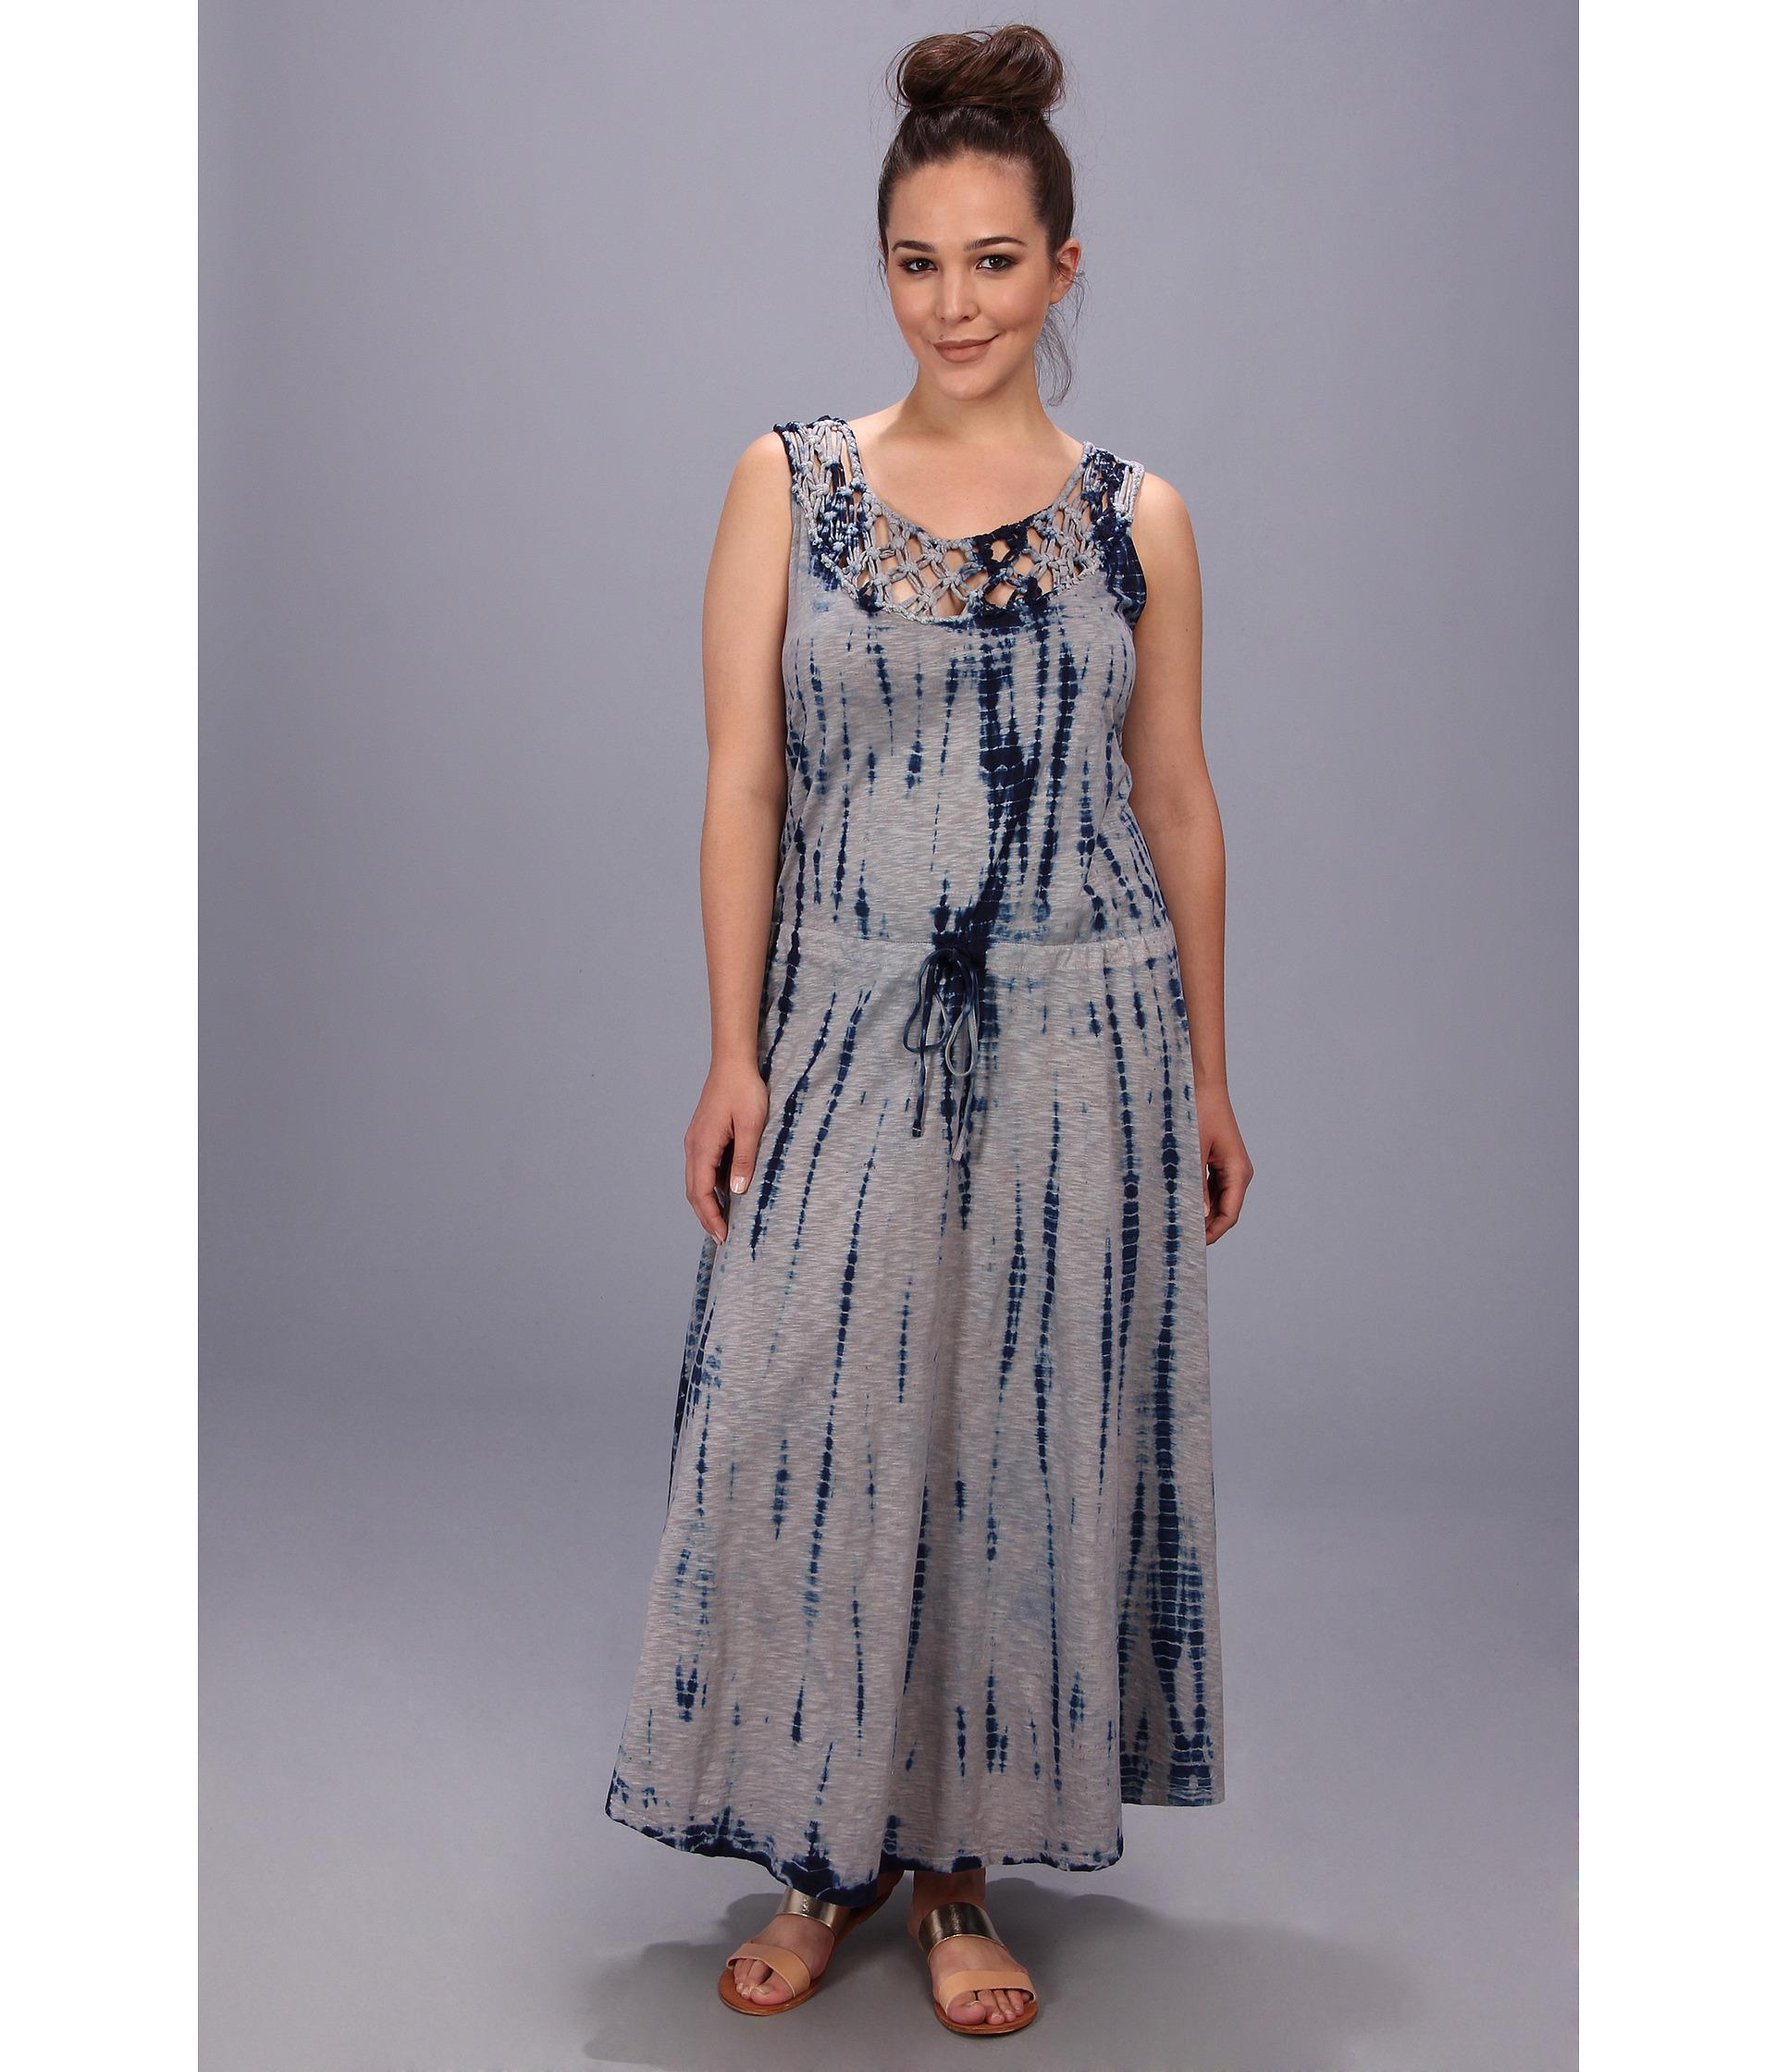 Cato S Plus Size Maxi Dress – Fashion dresses